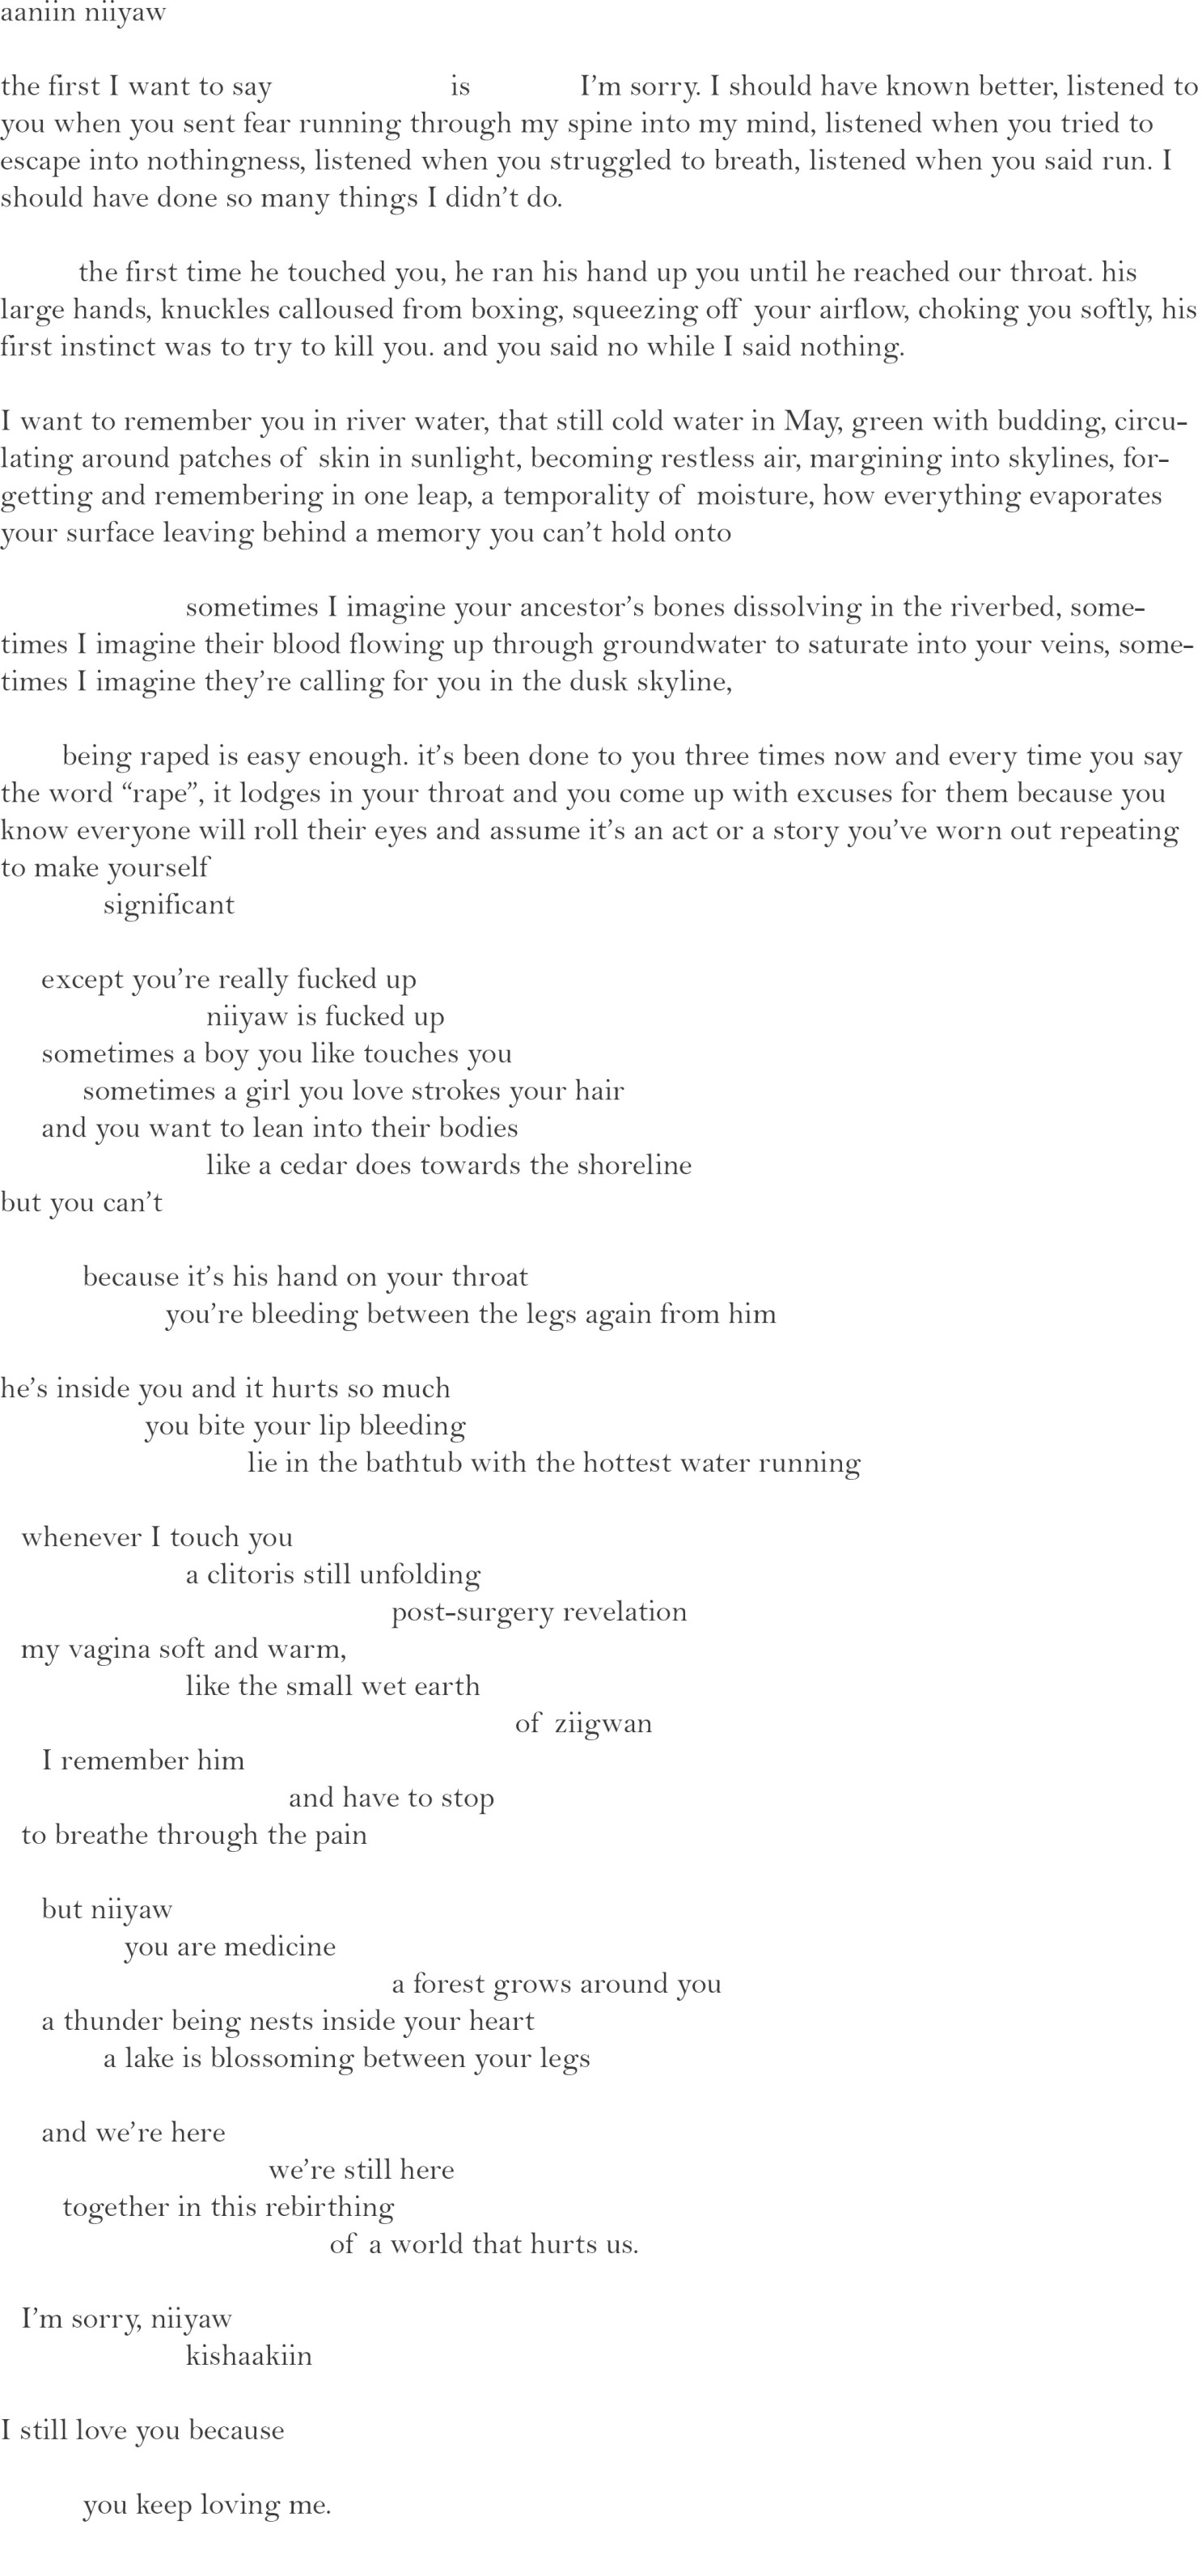 gwen poem 2.jpg